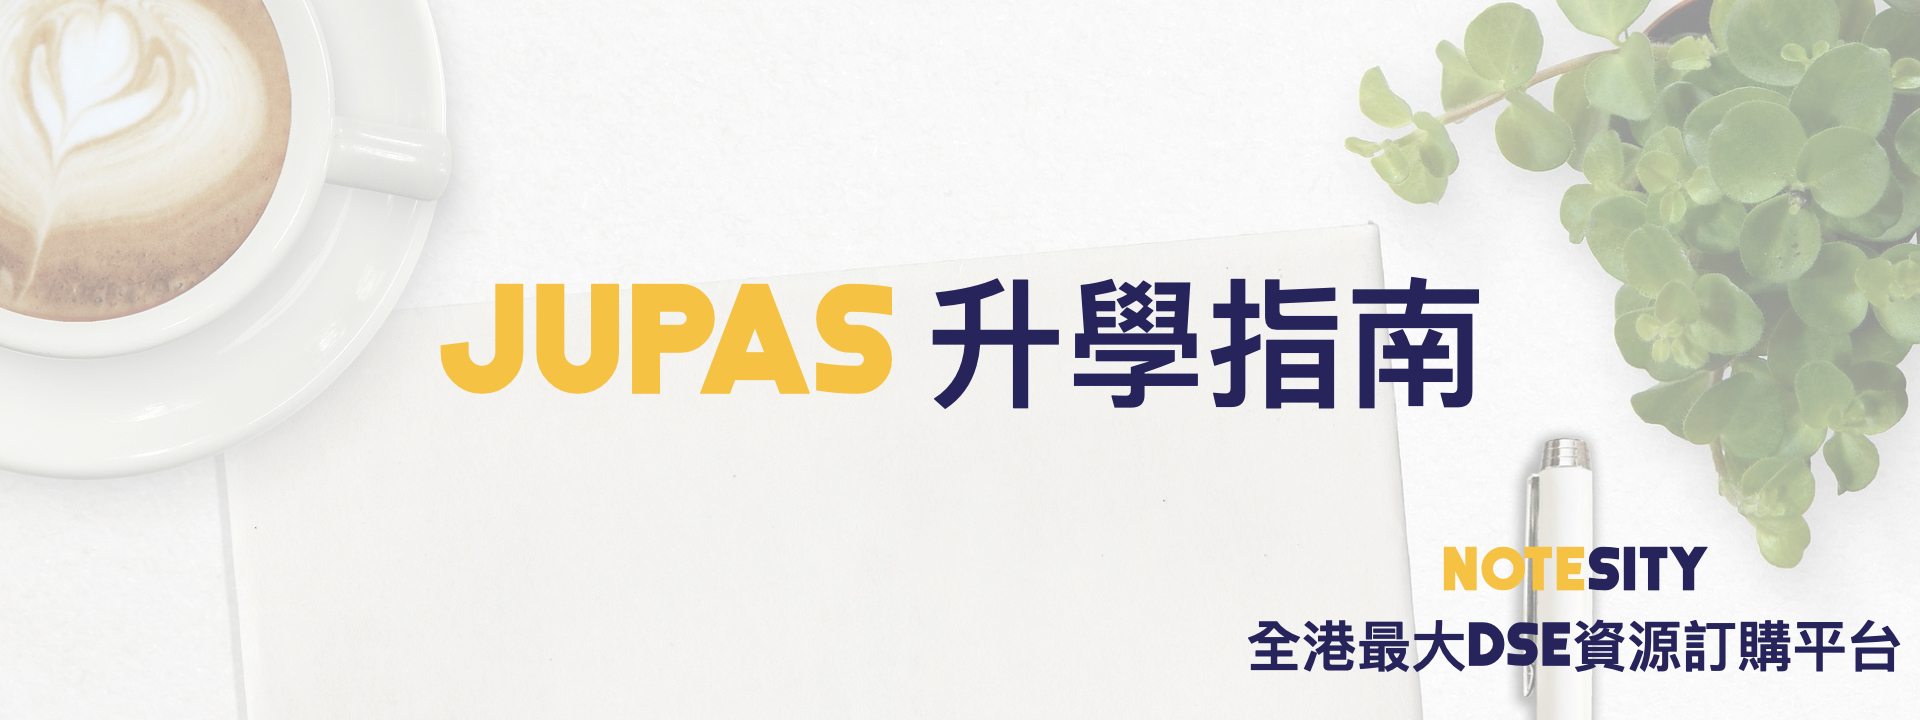 JUPAS升學指南